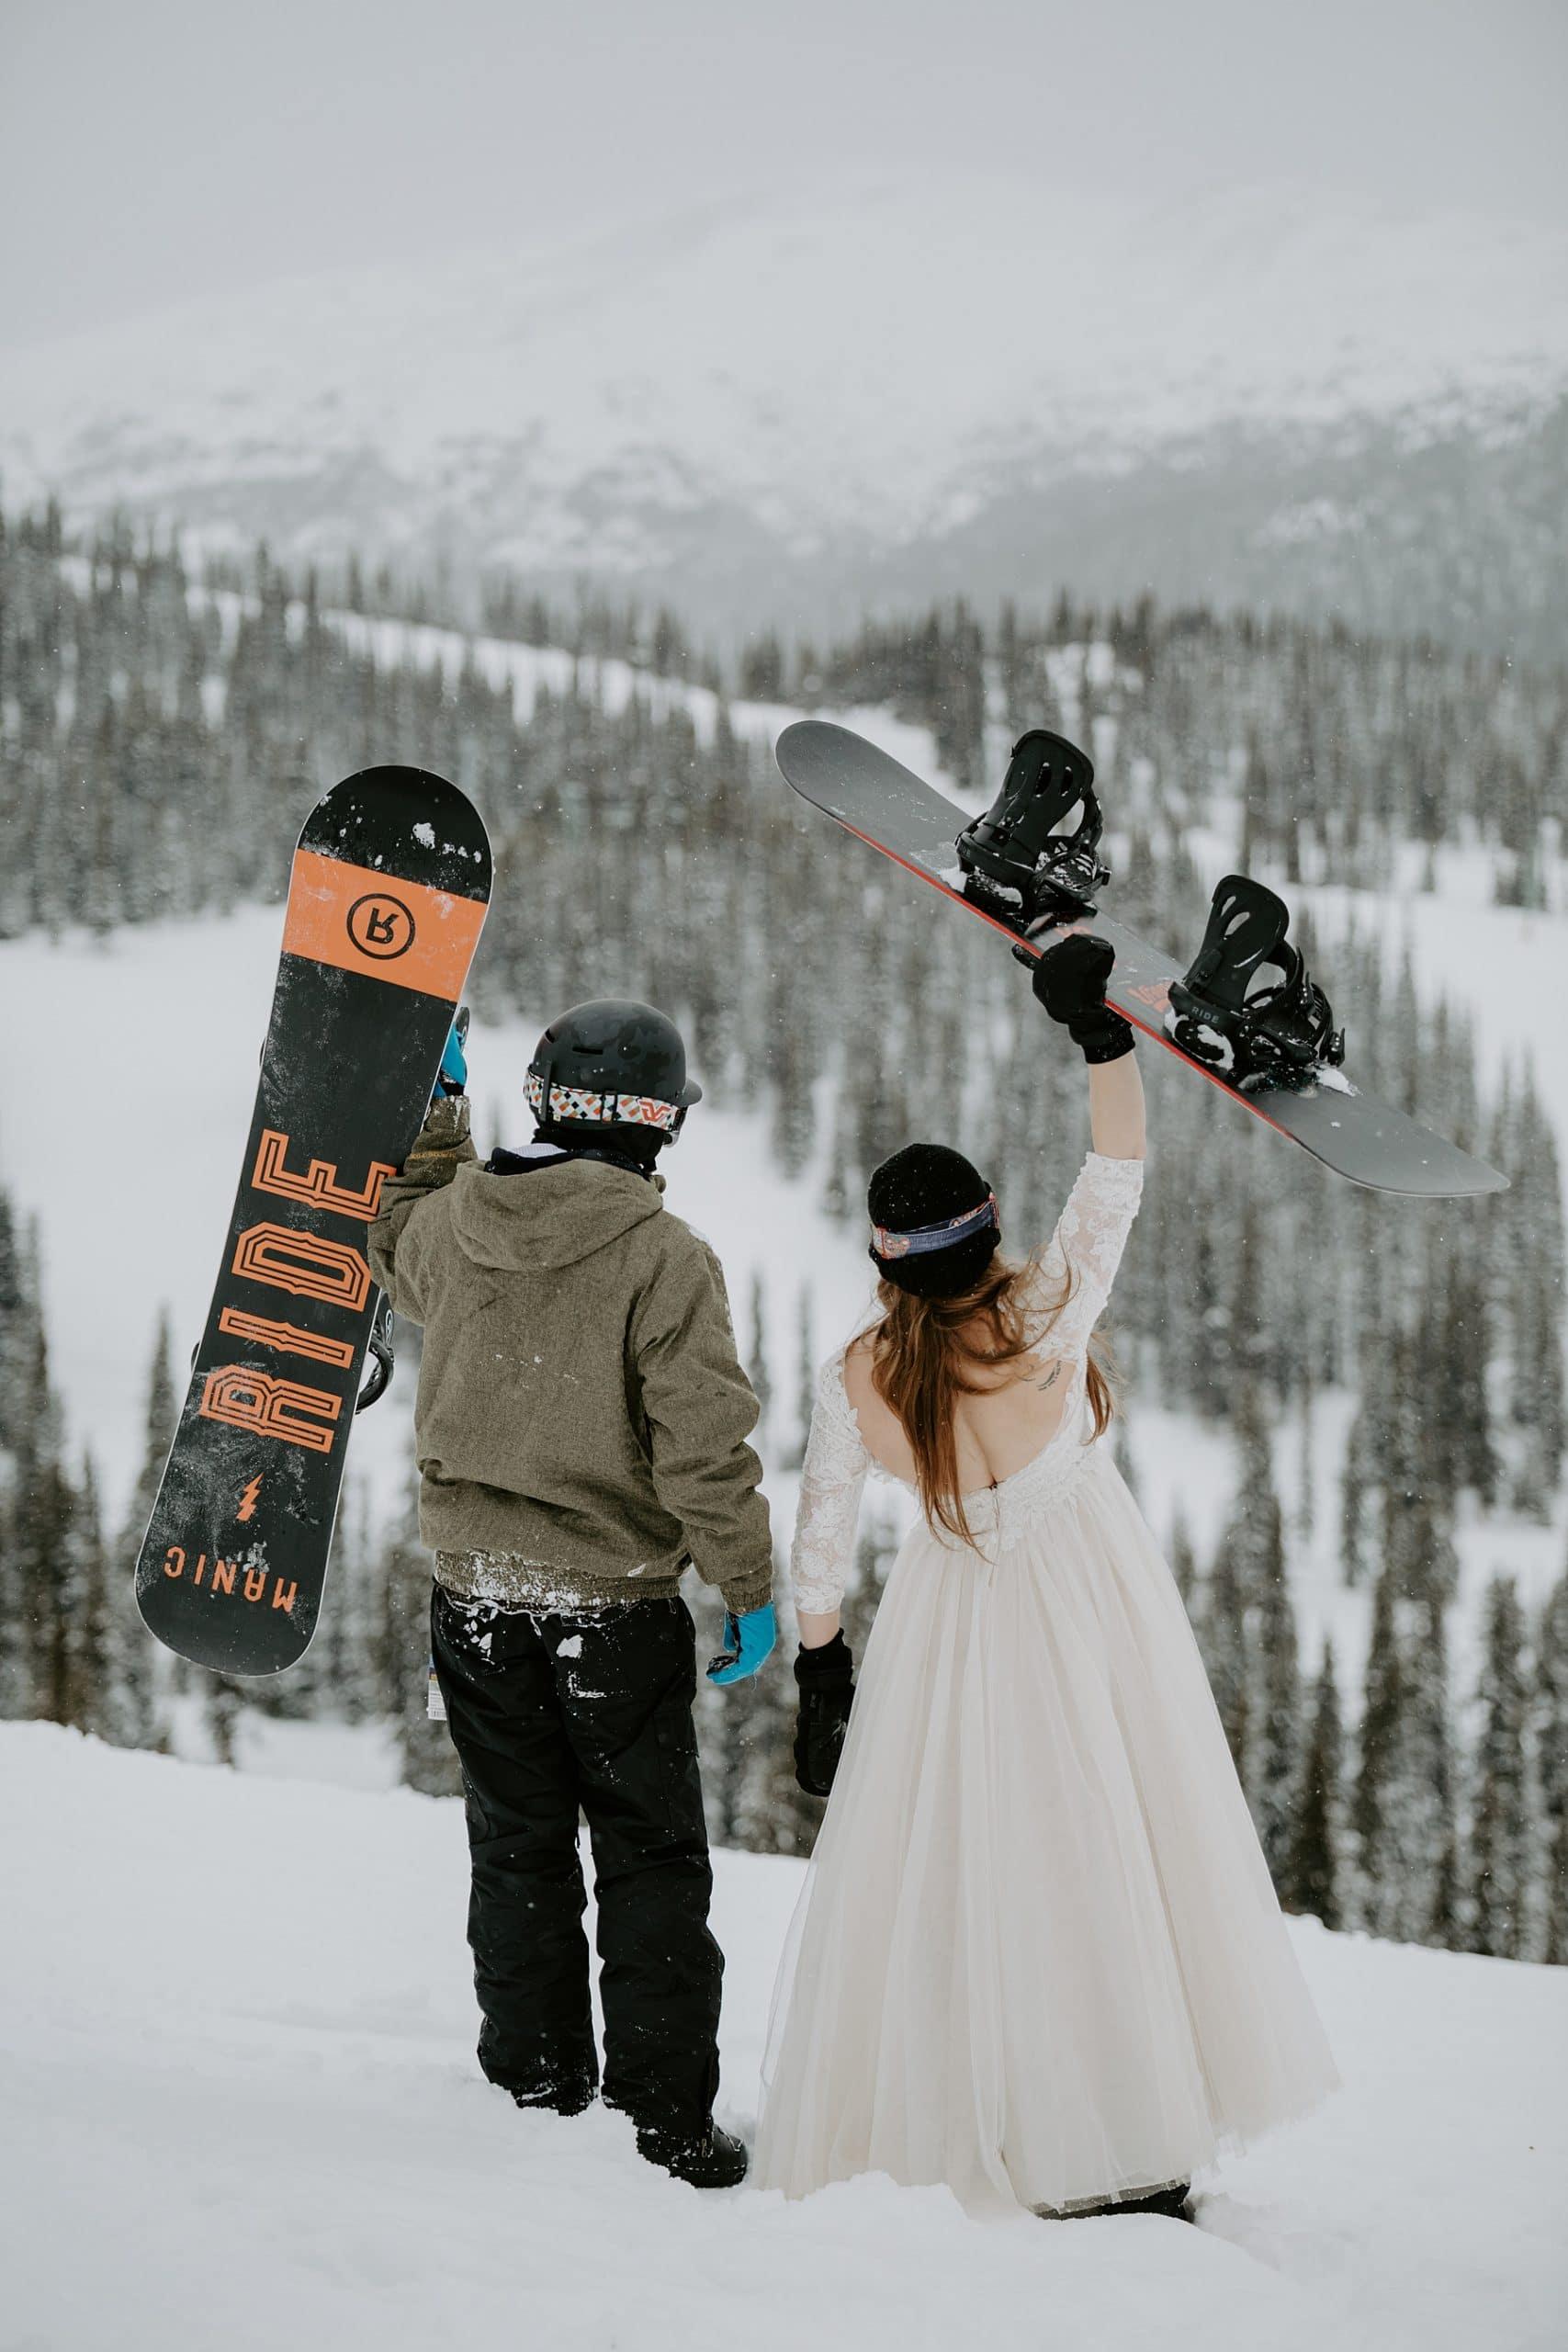 Snowboarding wedding at Marmot Basin in Jasper